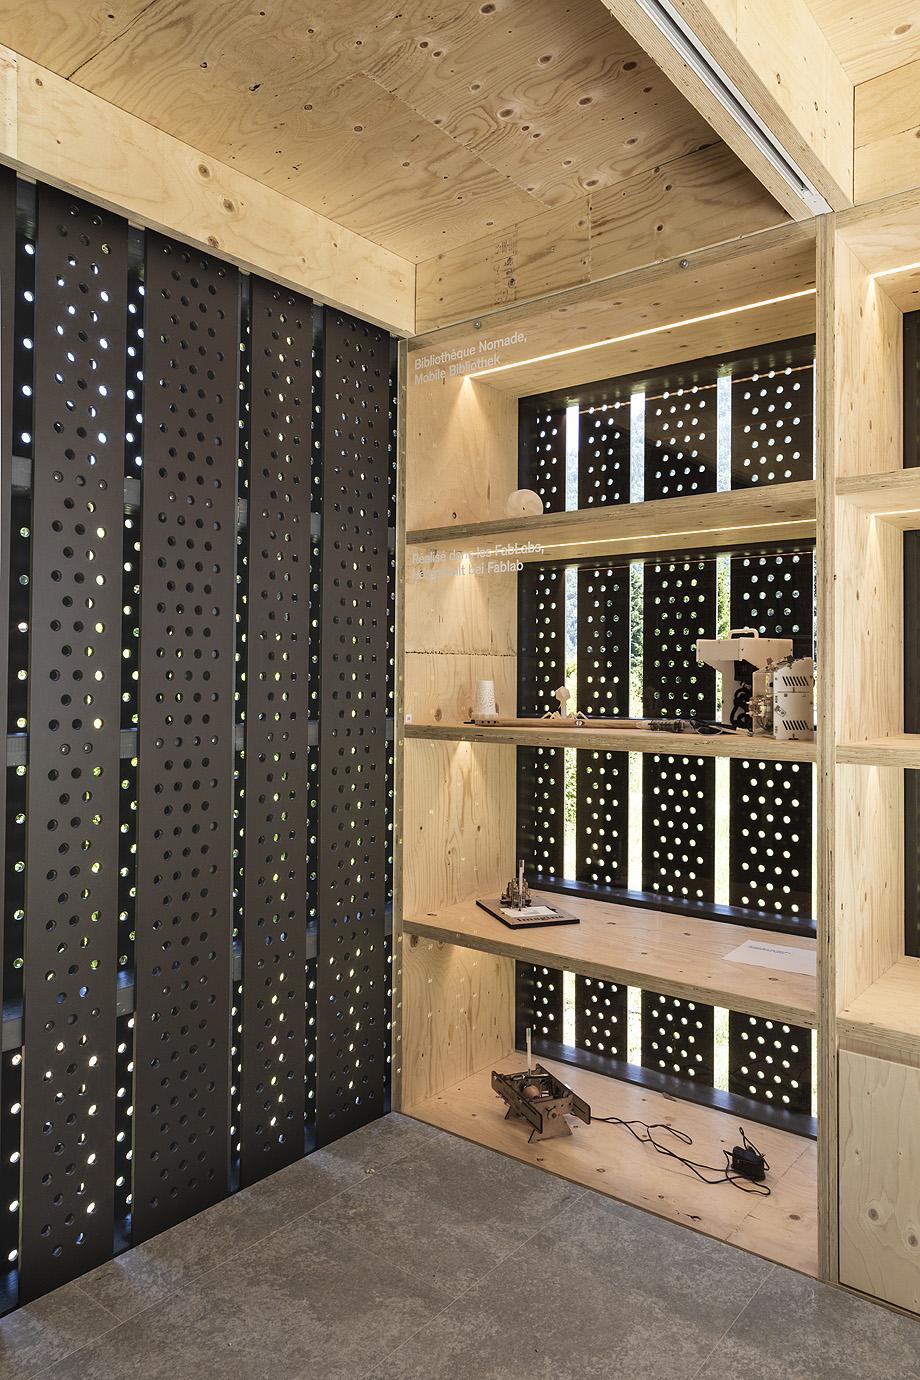 bex & arts pavilion de montalba architects - foto delphine burtin (3)